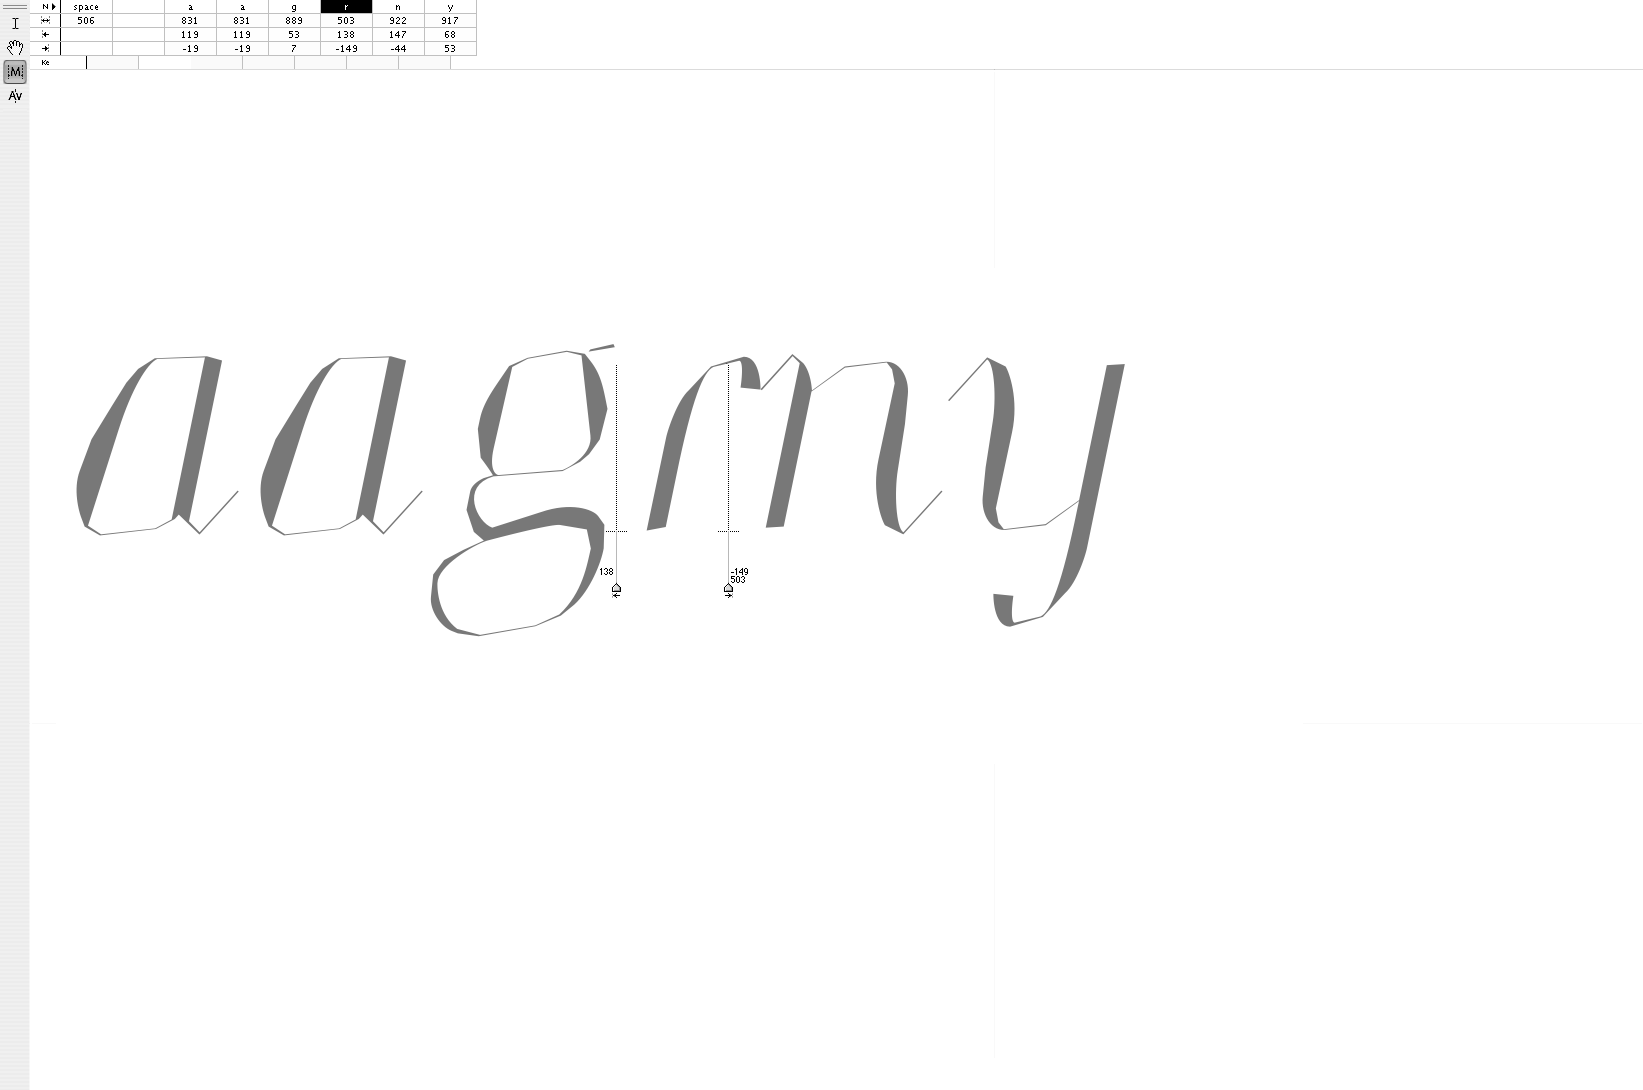 "'<em>aagrny</em>' · ""Melting"" Letters' Rhythm"